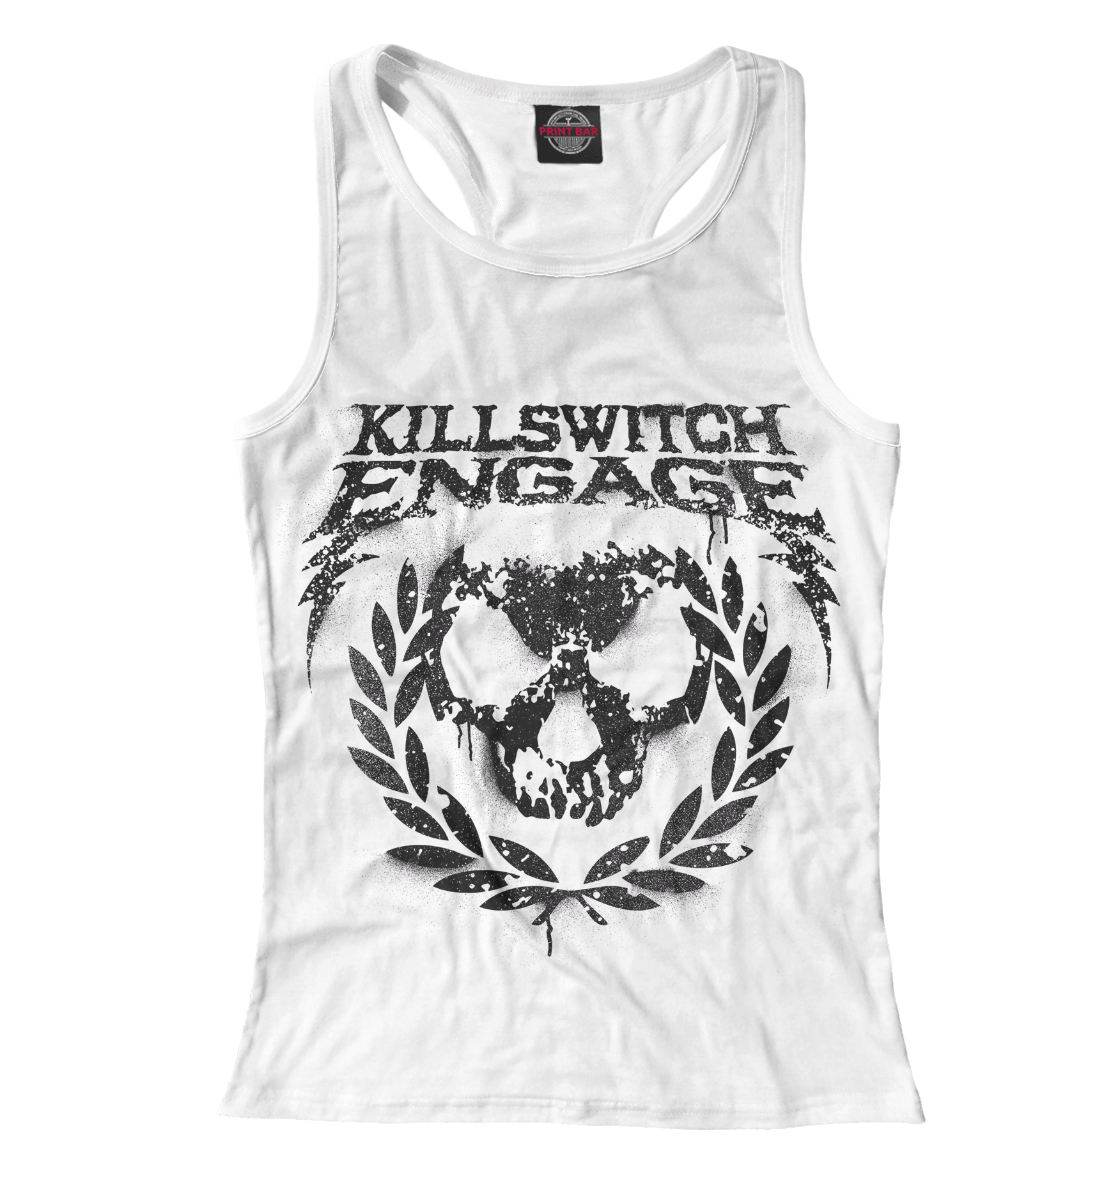 Купить Killswitch Engage, Printbar, Майки борцовки, KSE-339241-mayb-1